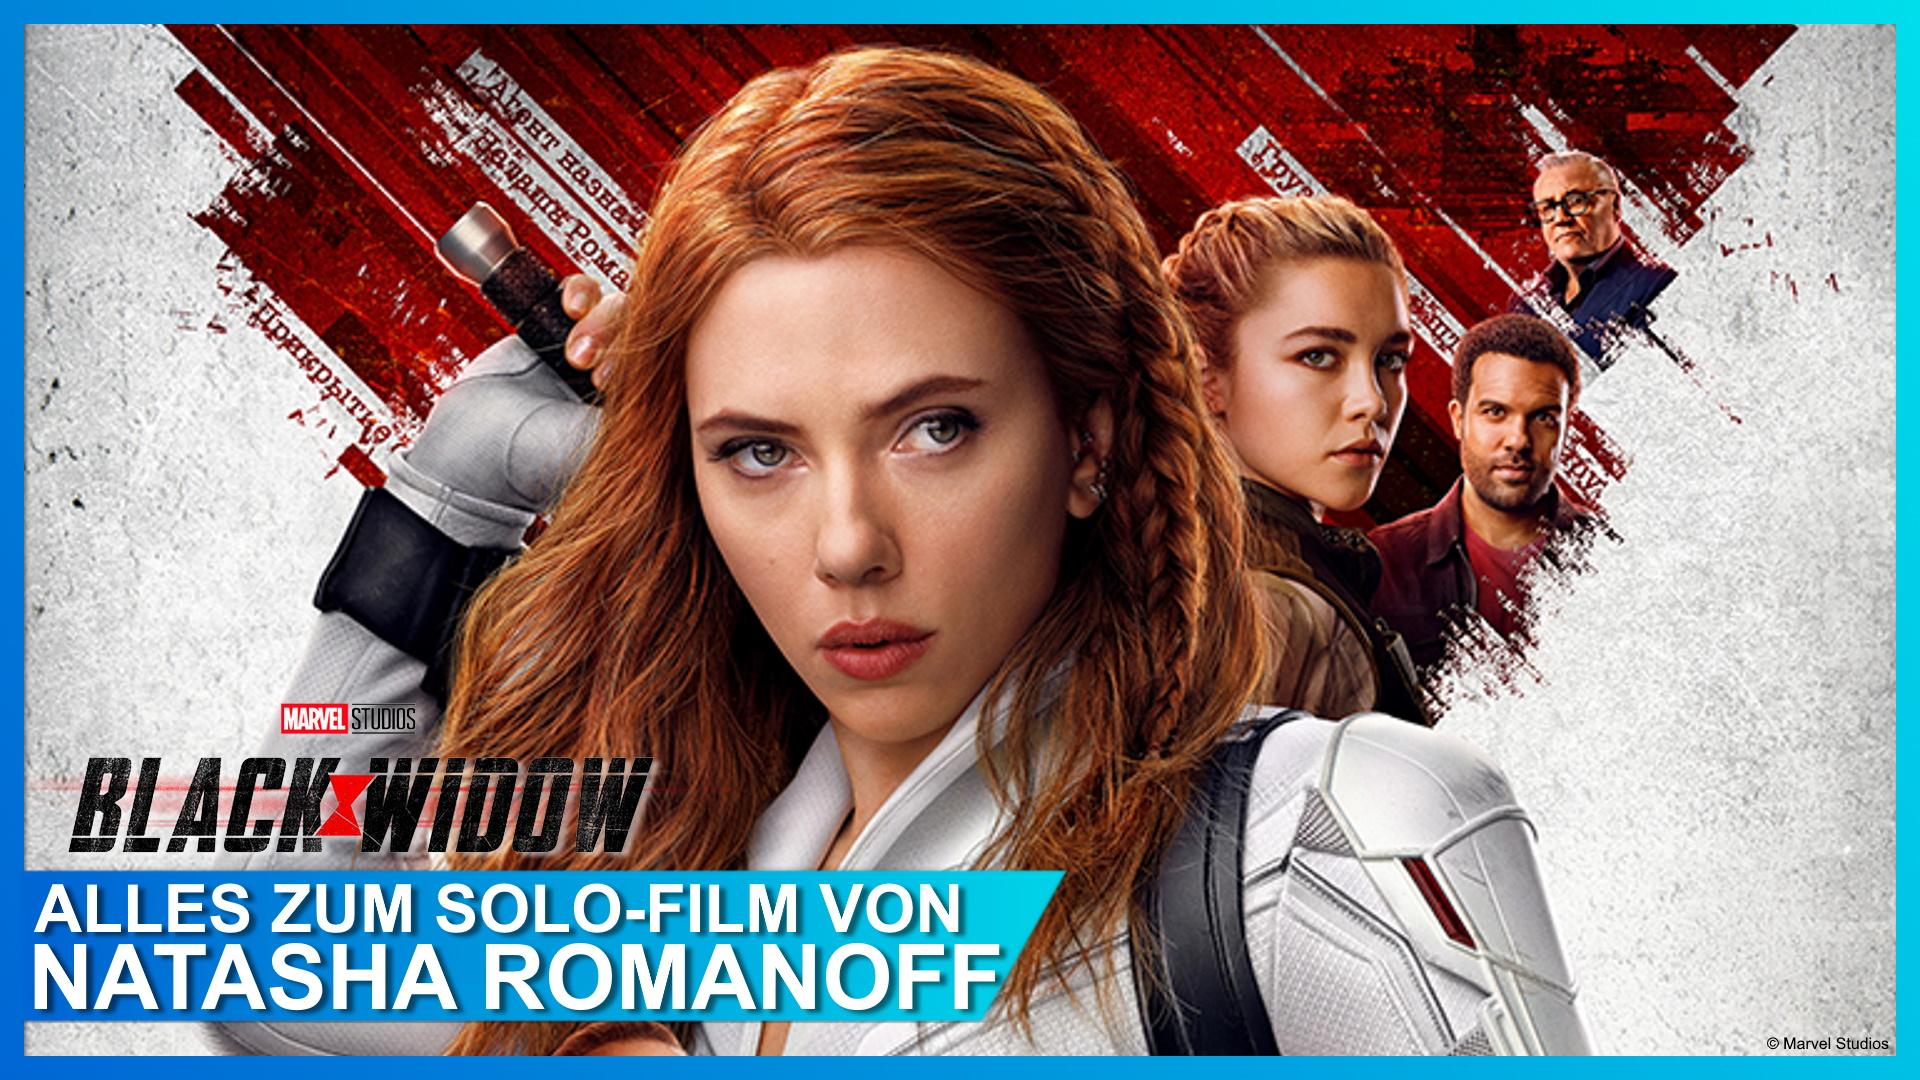 Marvel Studios' BLACK WIDOW – Alles zum Solo-Film von Natasha Romanoff